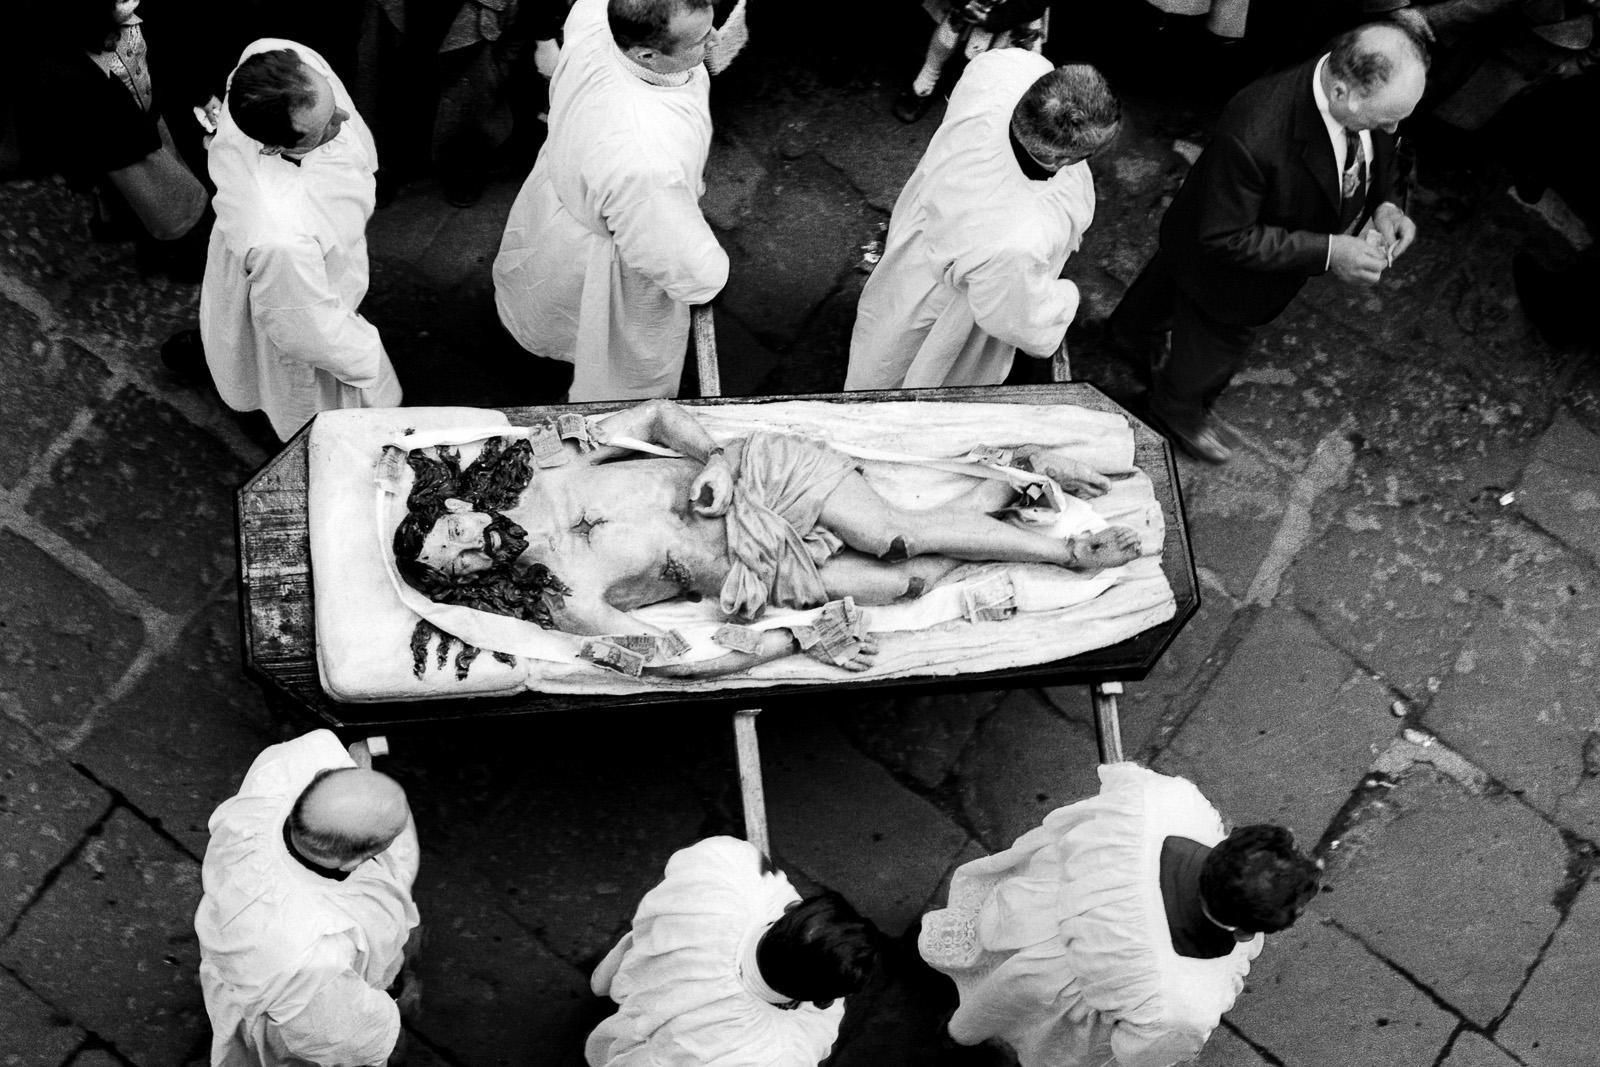 Sacra Rappresentazione del Venerdí Santo. Barile, 16 aprile 1976